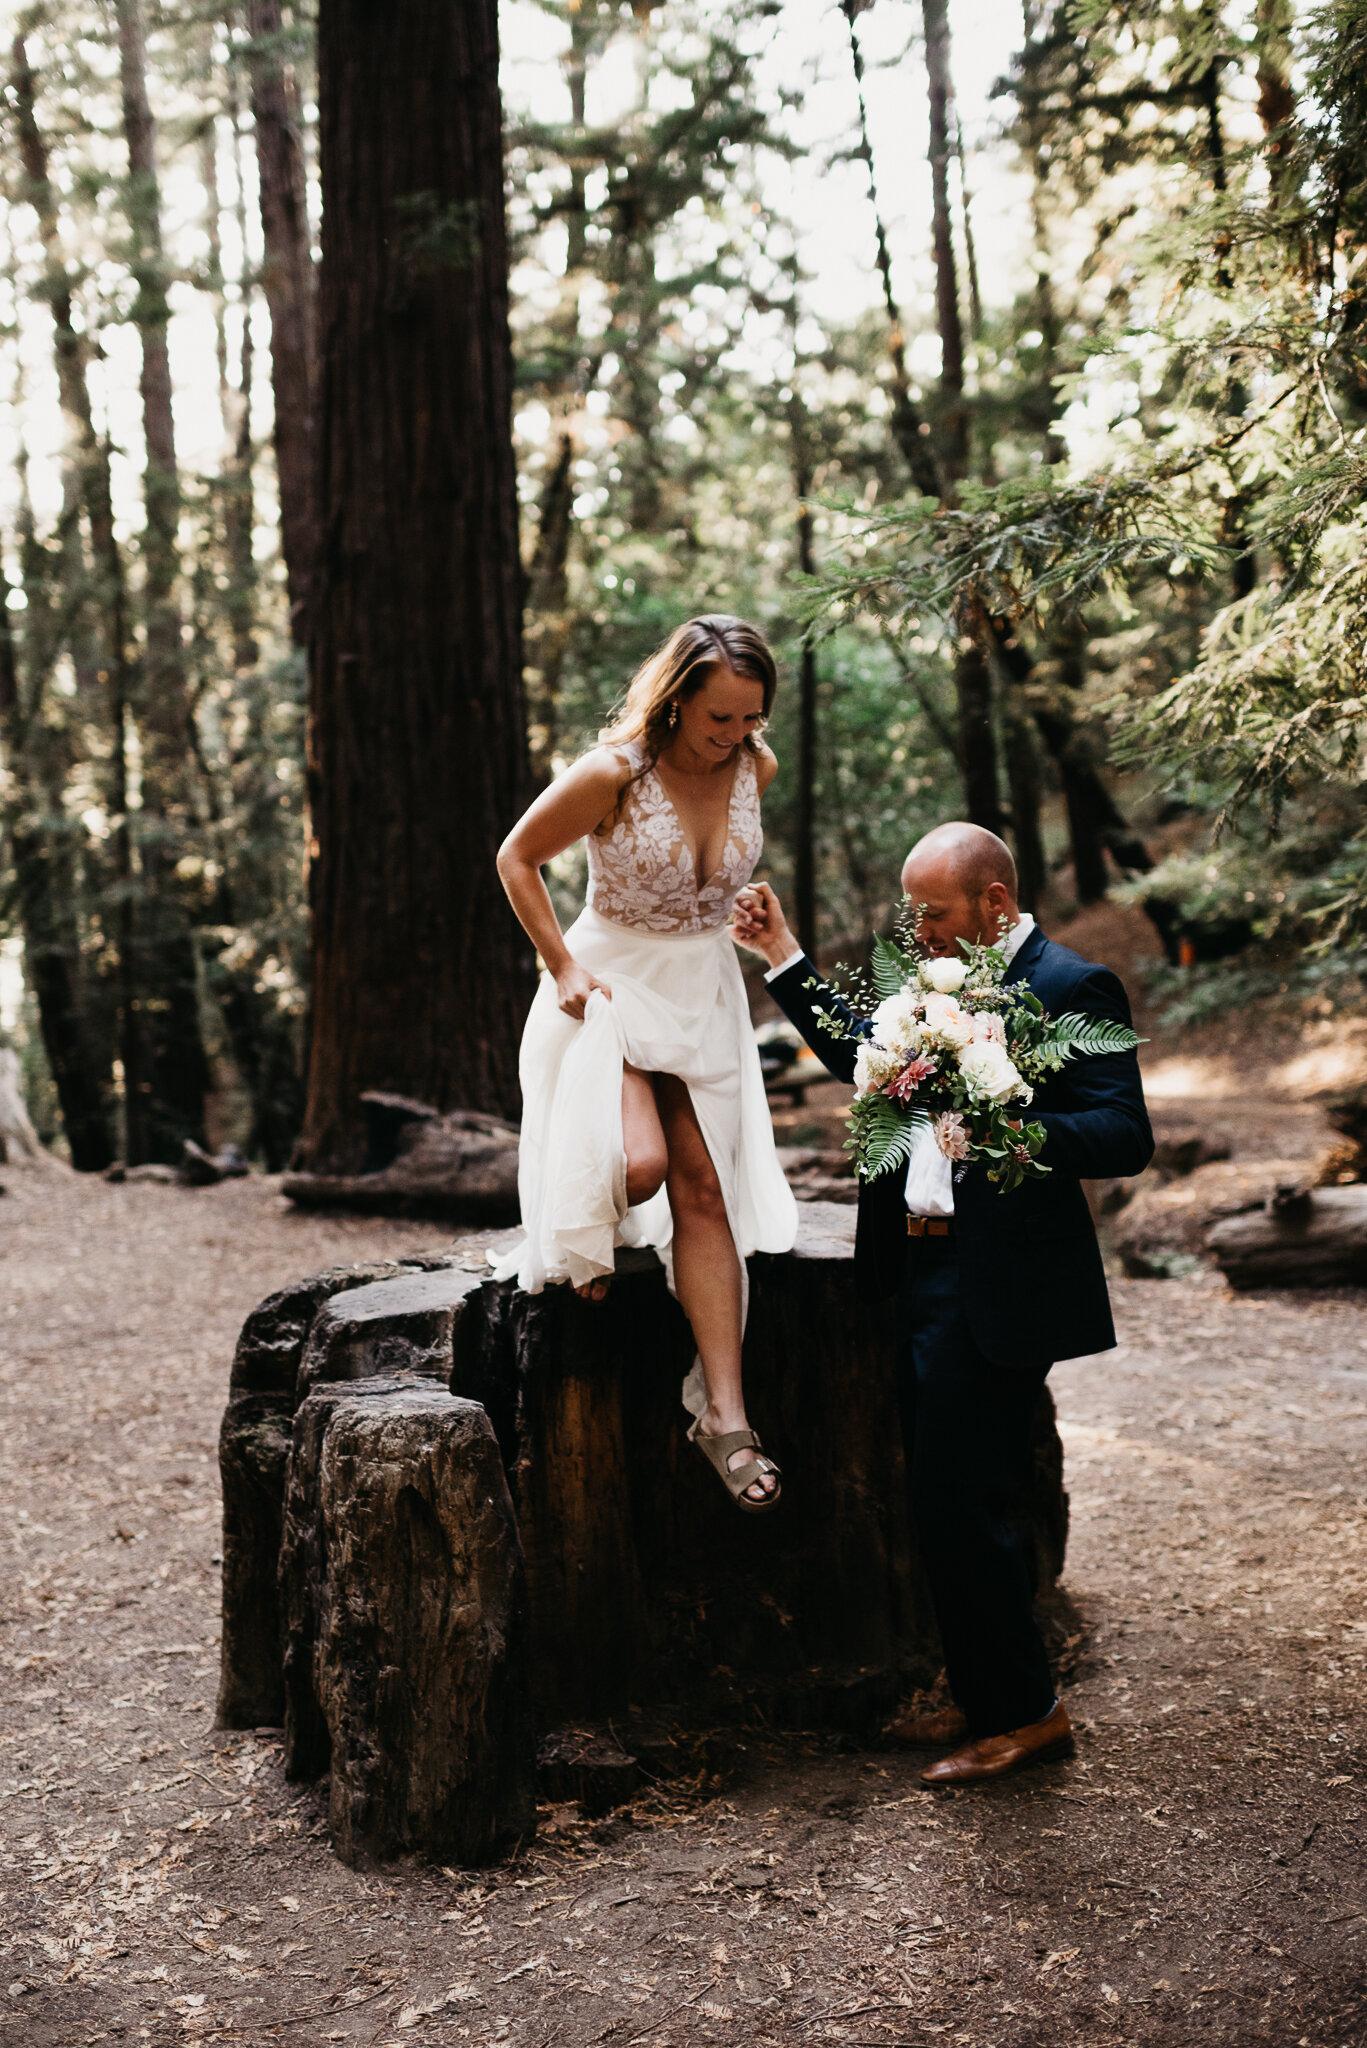 Cailfornia wedding photographer-10.jpg